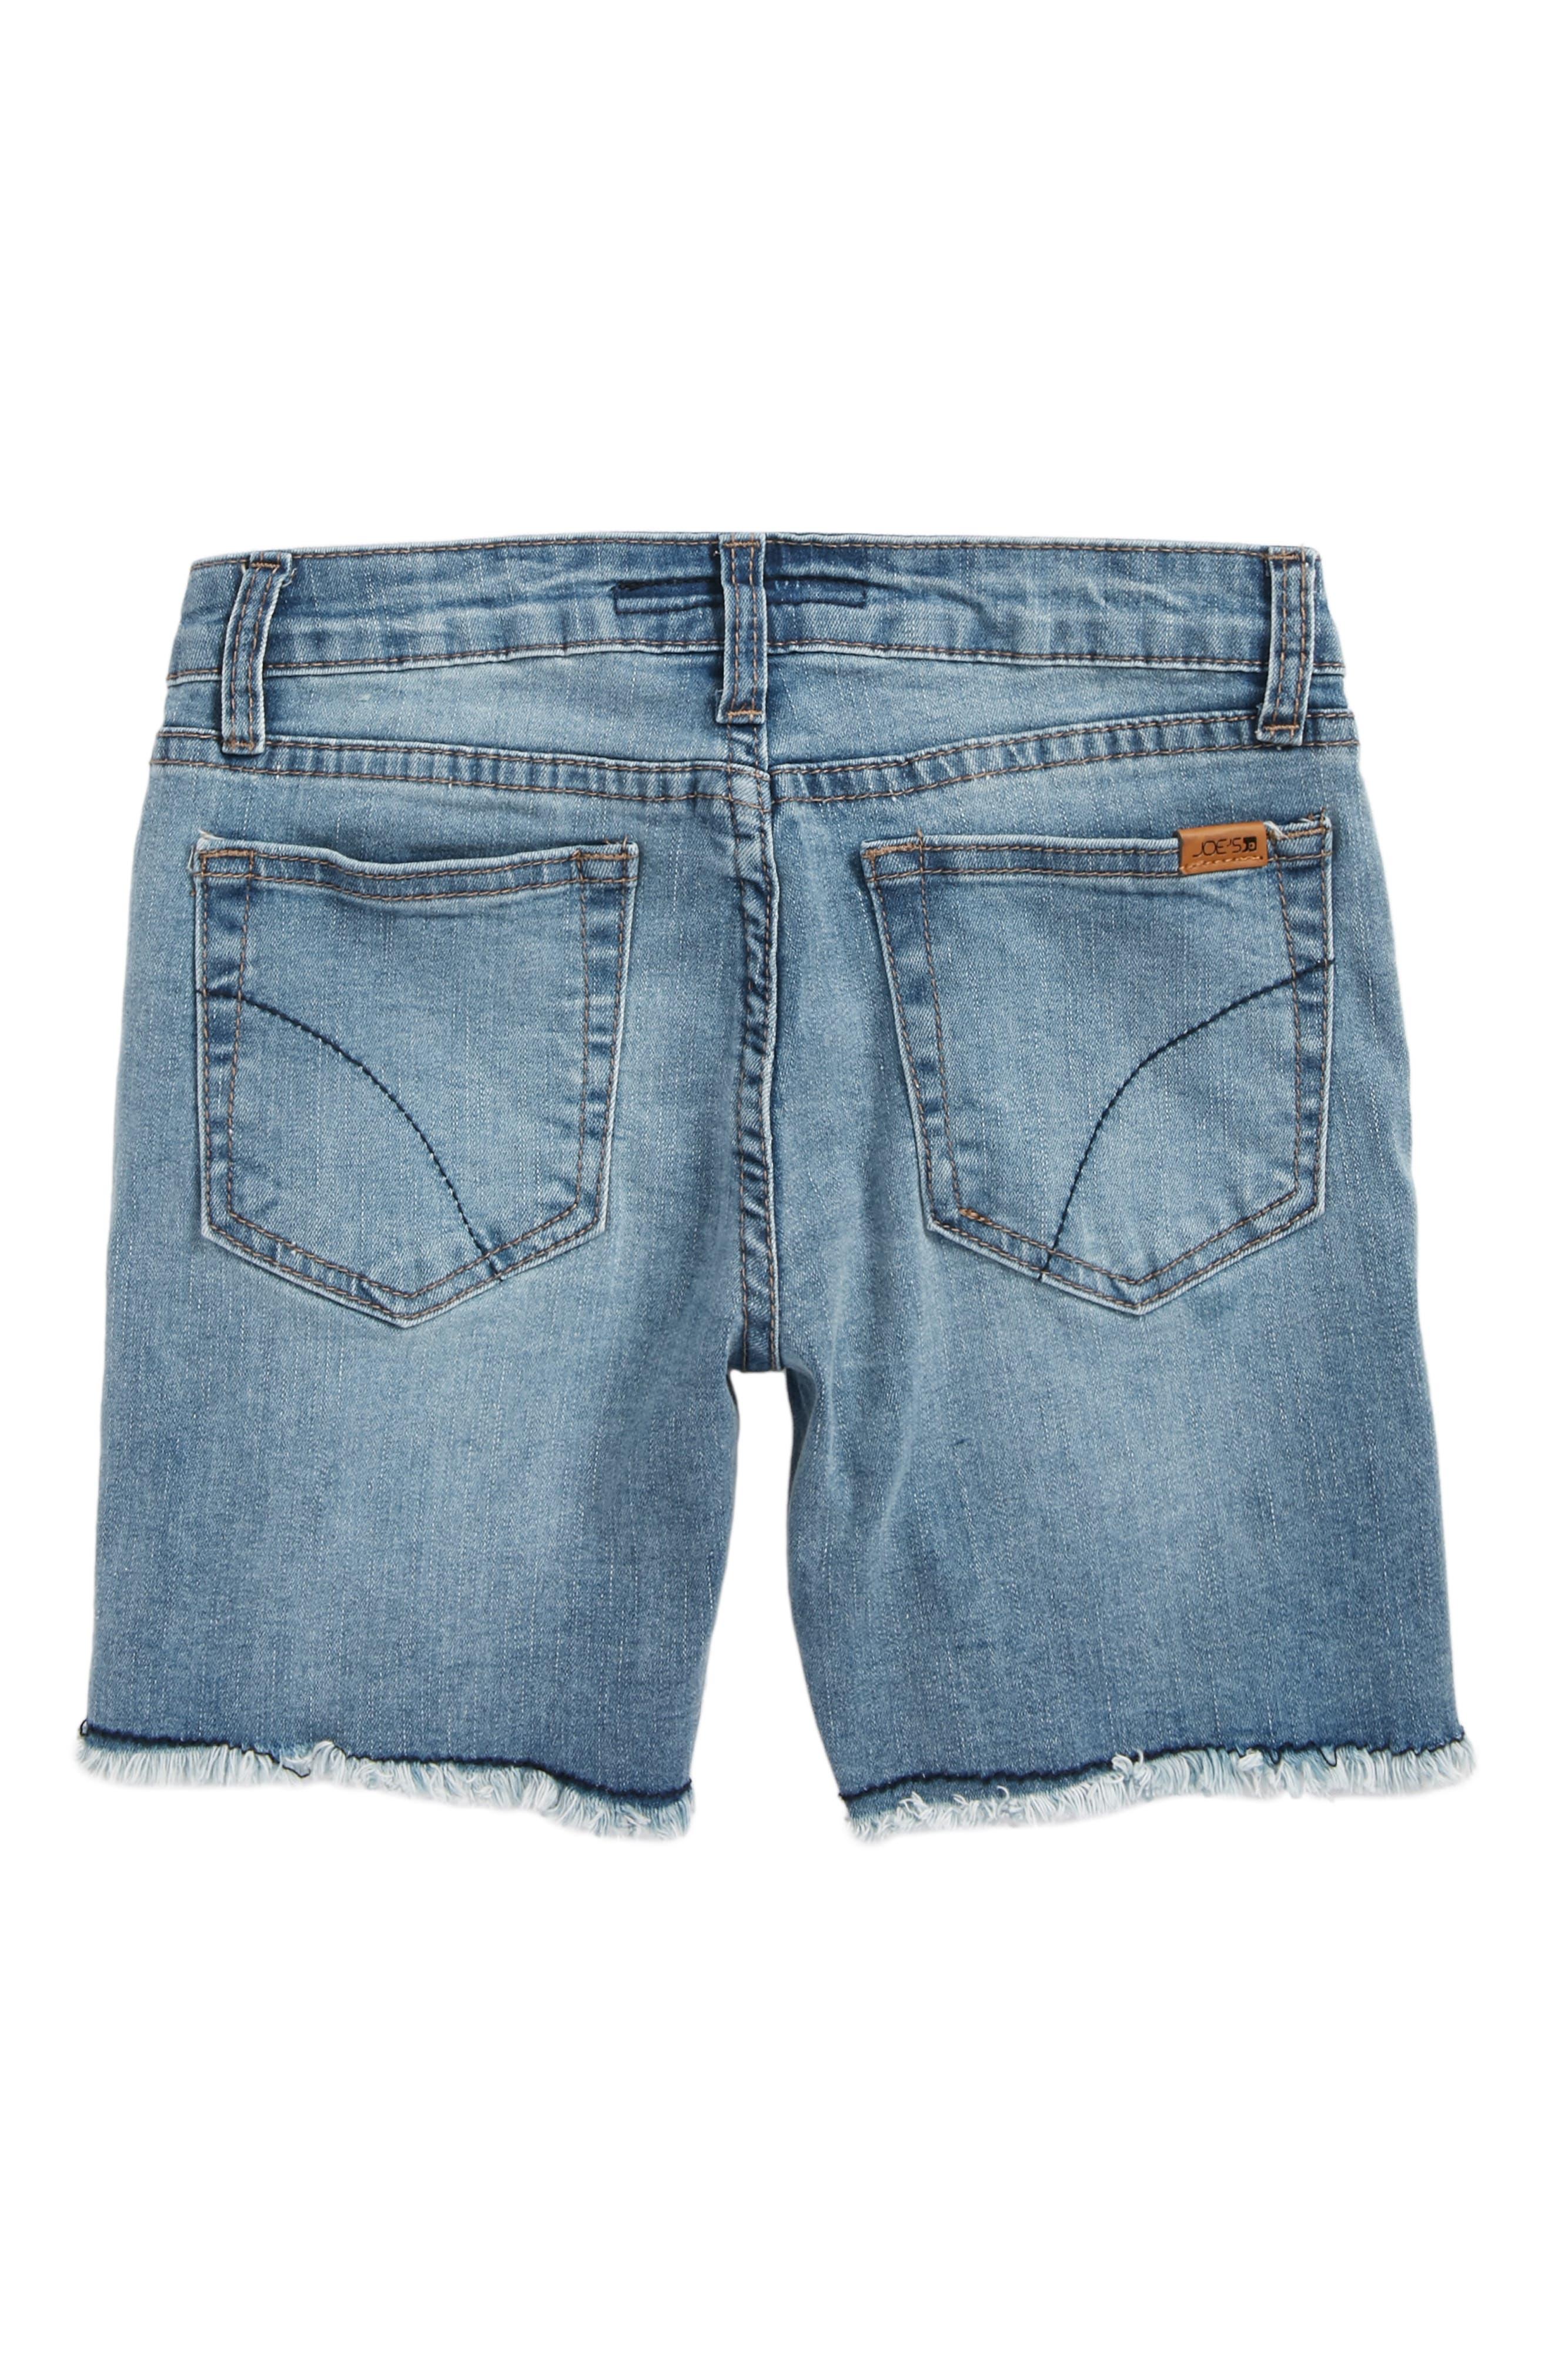 Frayed Mid Rise Bermuda Denim Shorts,                             Alternate thumbnail 2, color,                             Mdw-Medium Wash